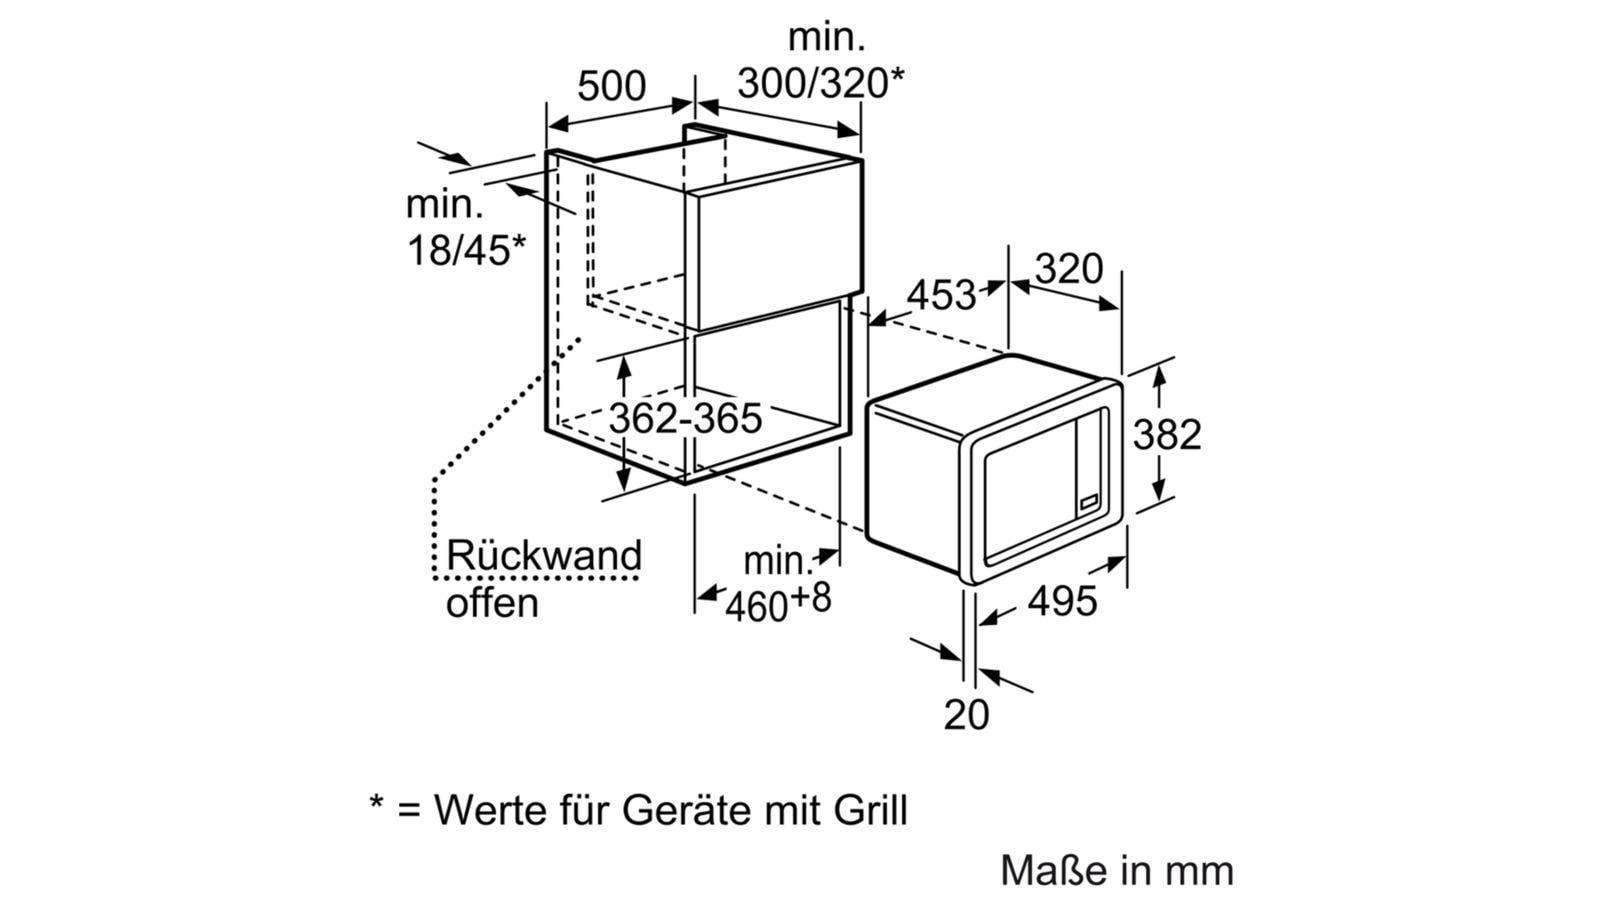 mikrowelle einbaugert free mikrowelle einbaugert cm sharp r fbst cm edelstahl einbau mikrowelle. Black Bedroom Furniture Sets. Home Design Ideas